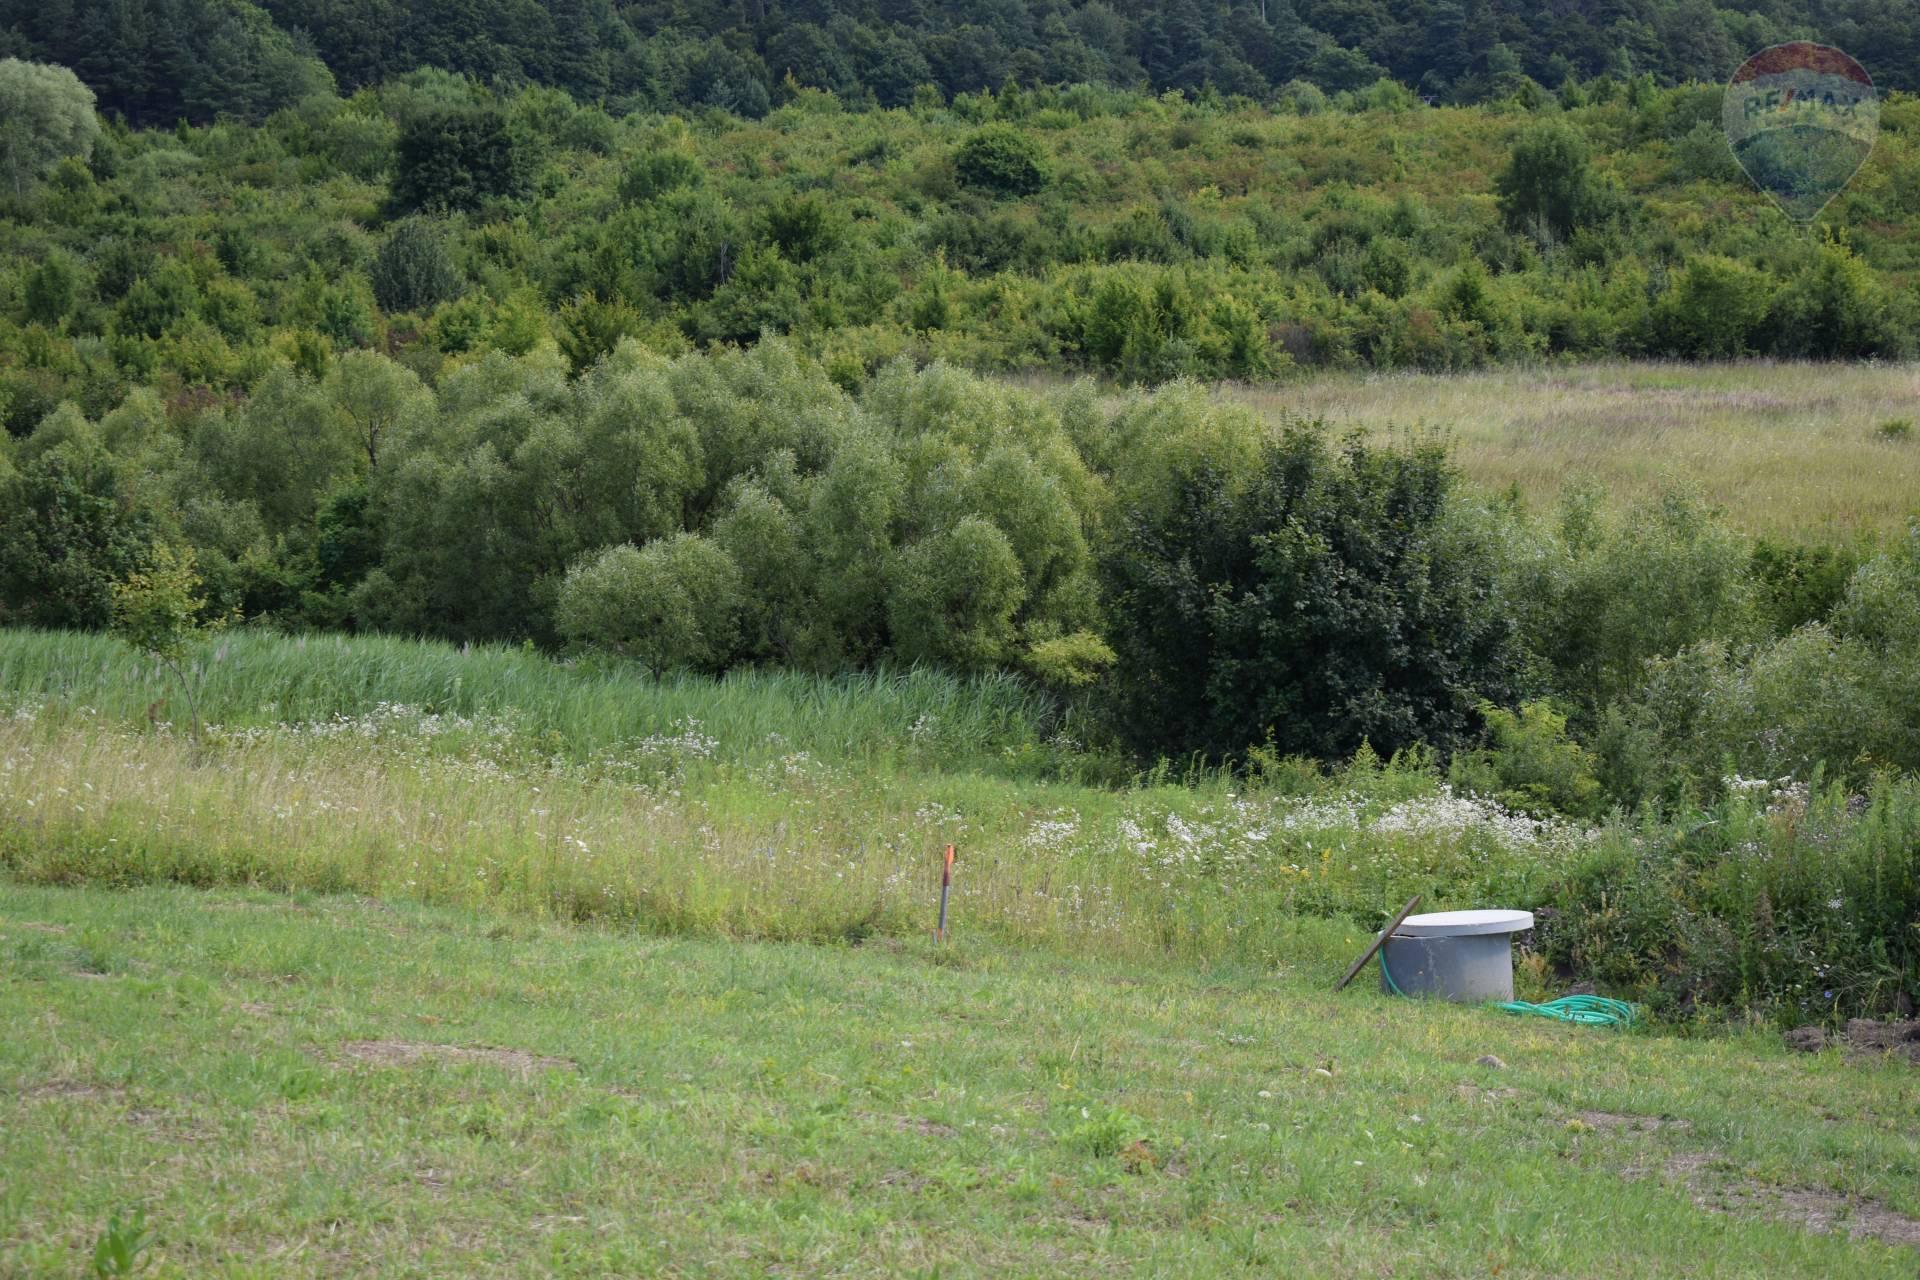 Predaj pozemku 1251 m2, Fintice - Pozemok na predaj Fintice